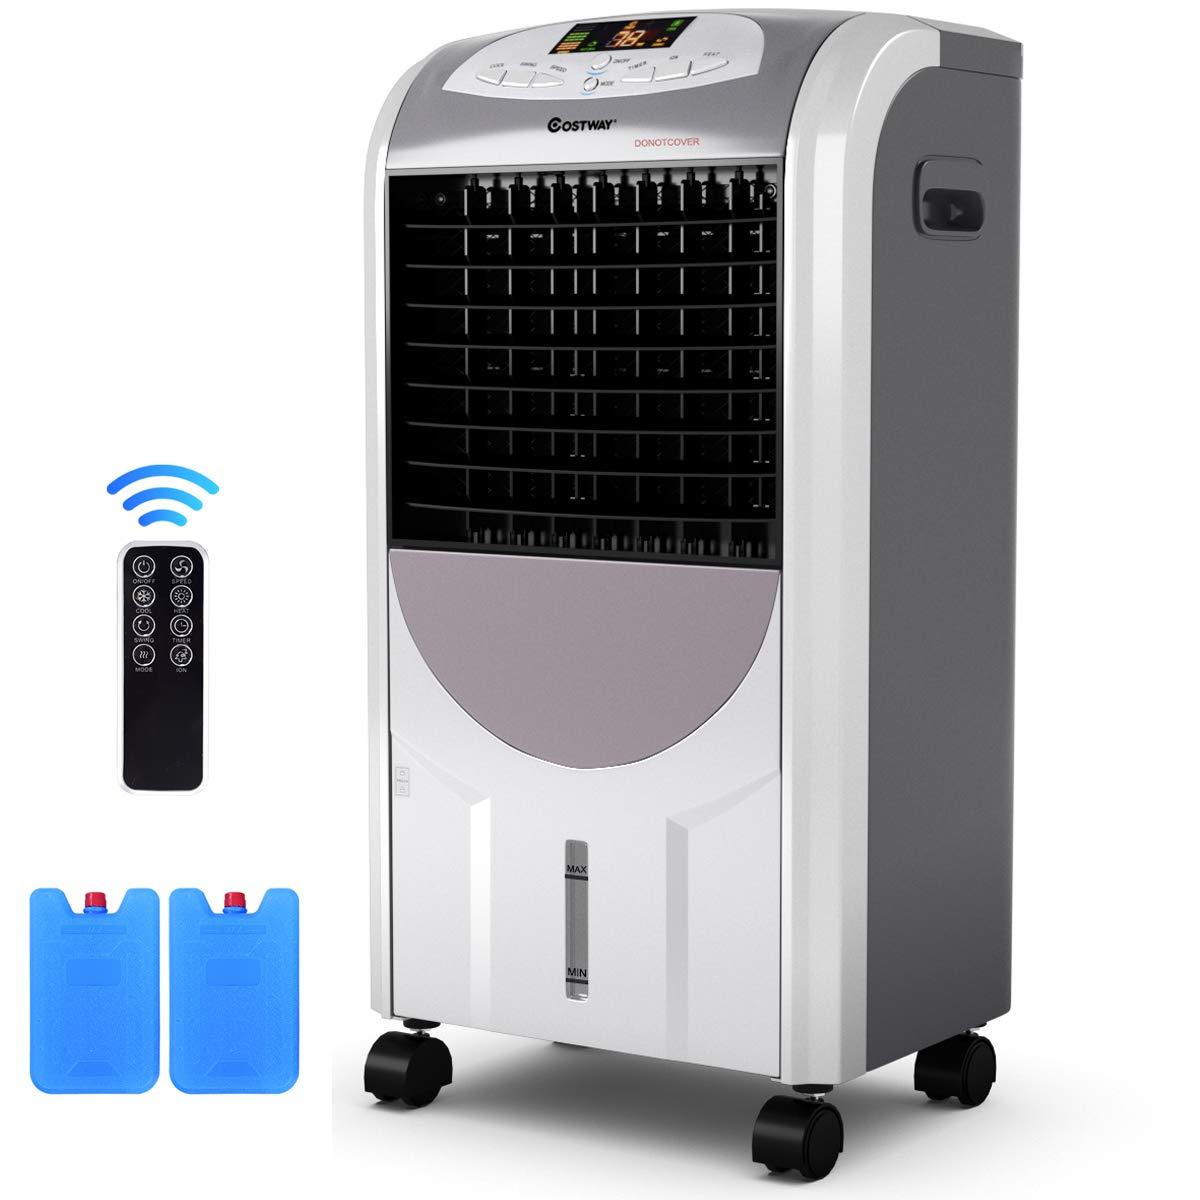 COSTWAY Compact Portable Conditioner Humidifier